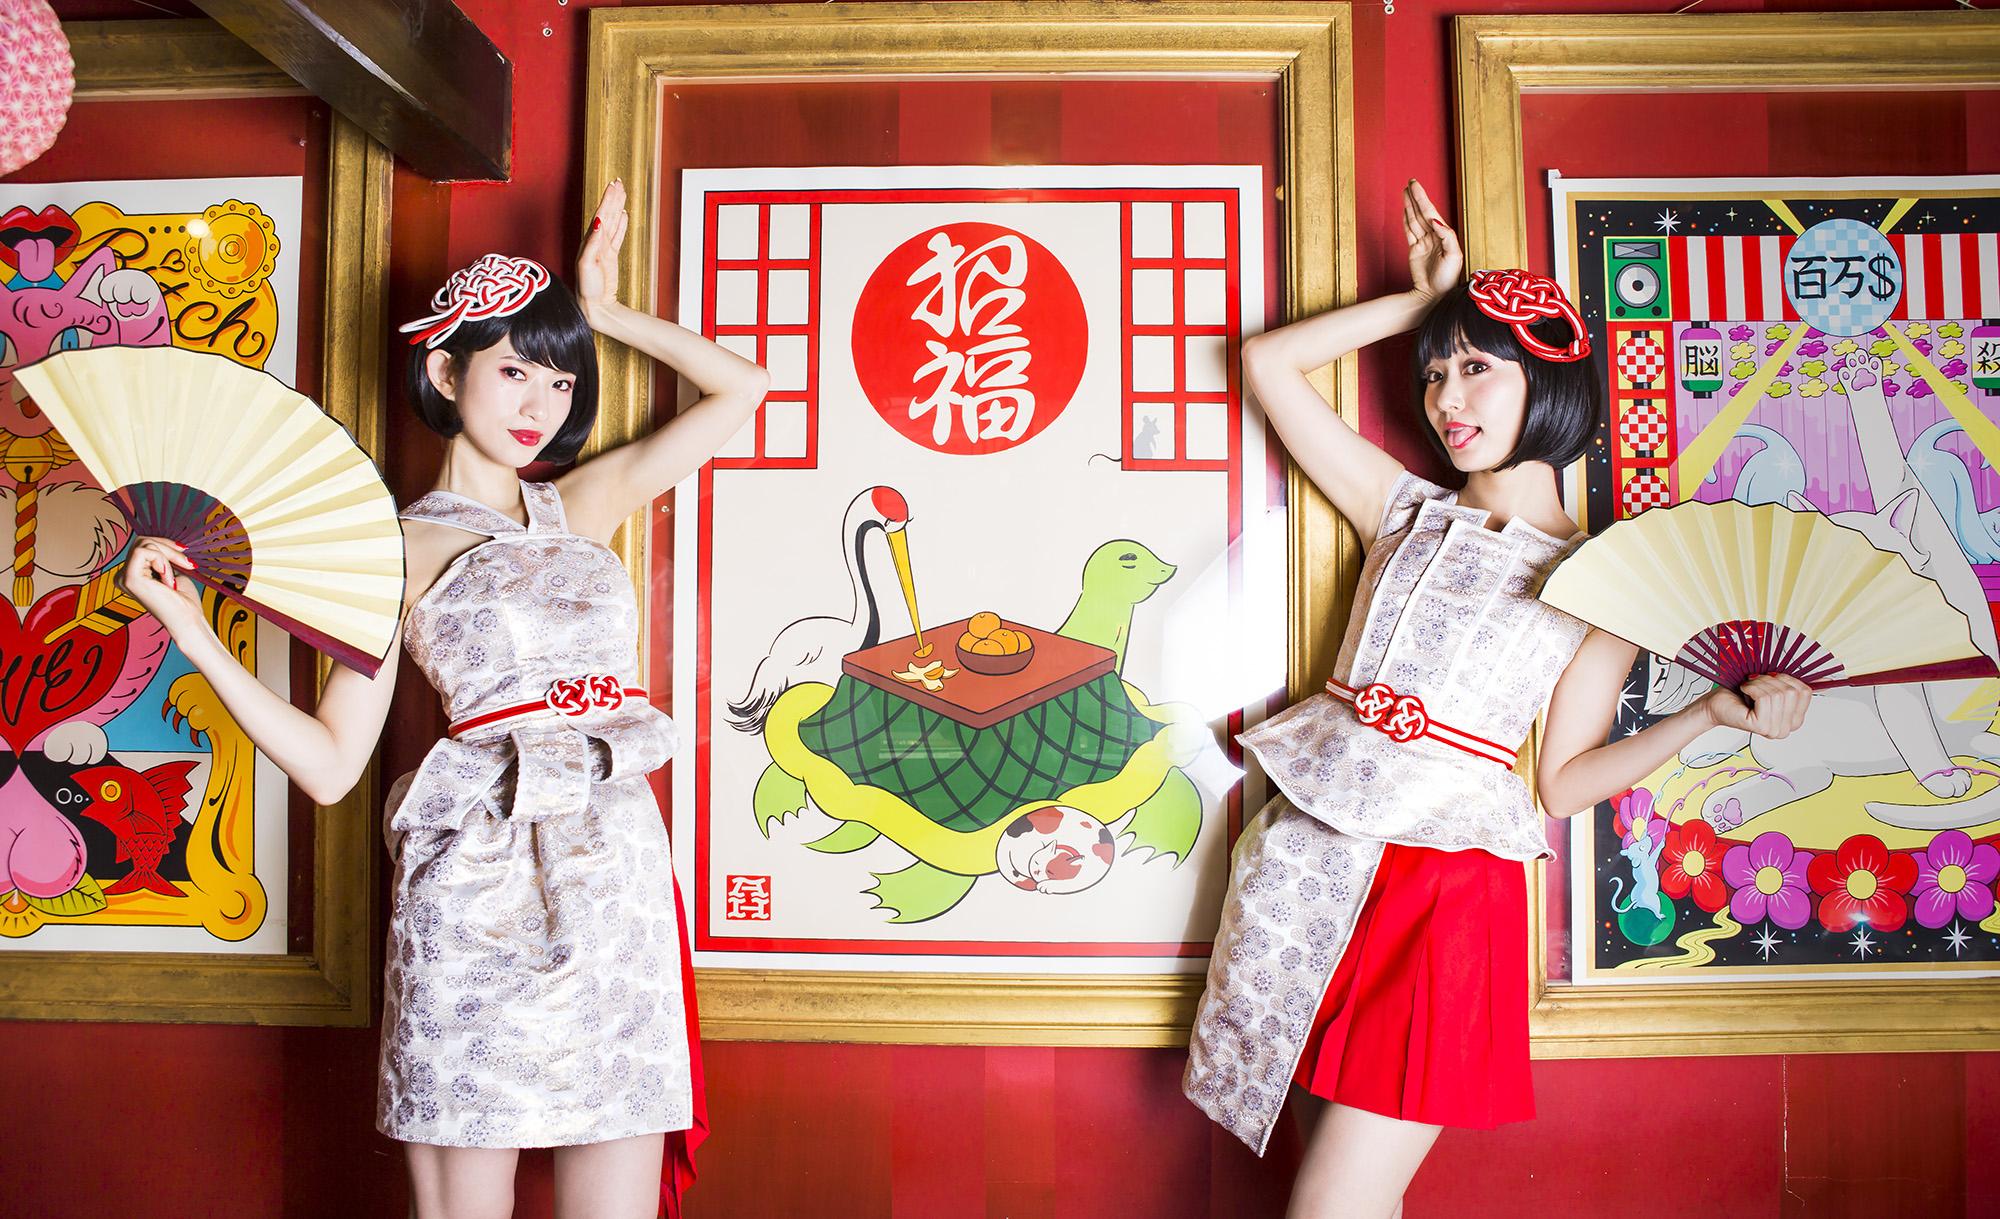 NekoPOP-YANAKIKU-Hachiko-Dance-artist-2017-06A